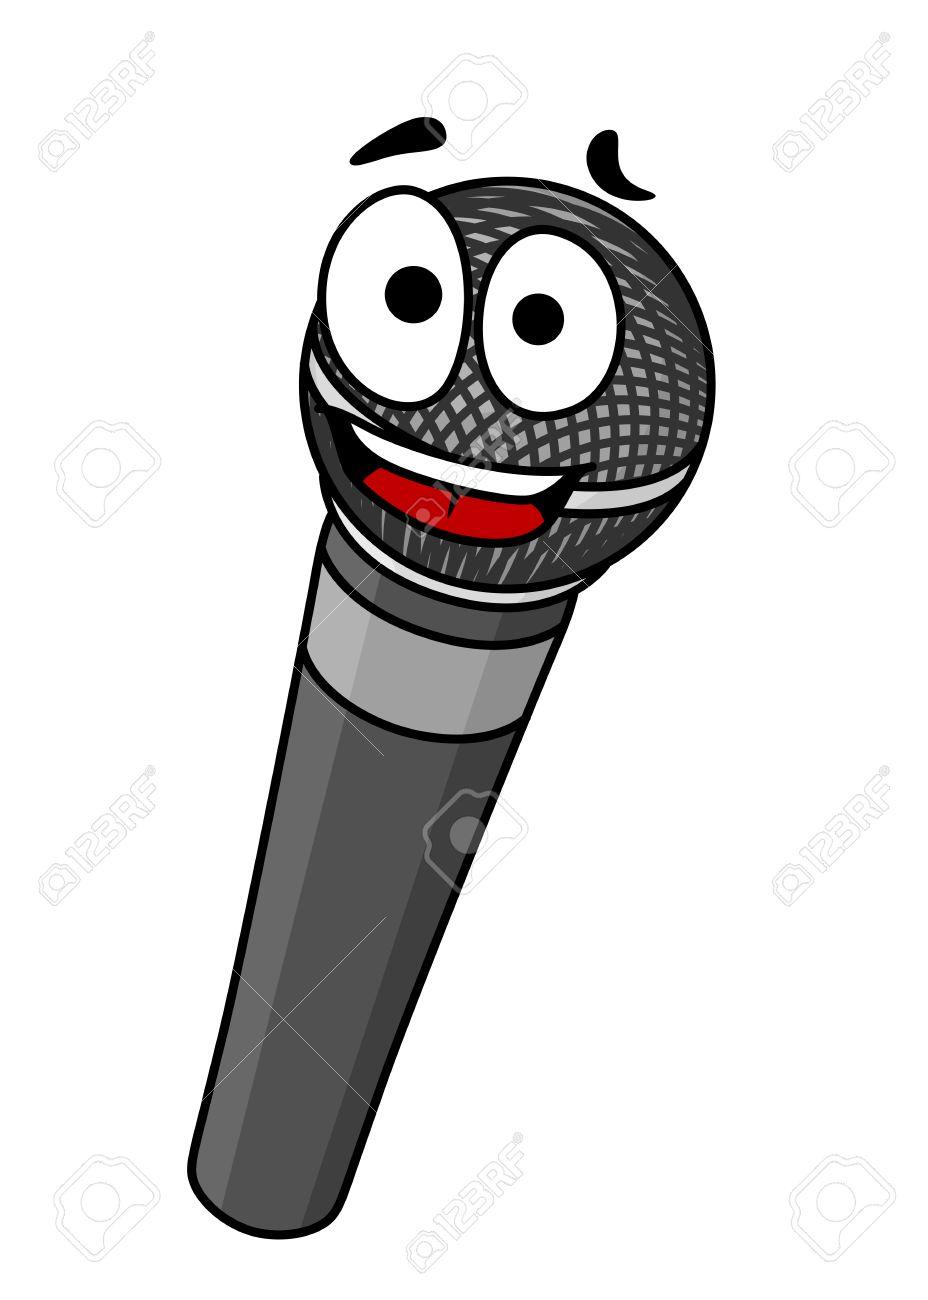 Microphone Cartoon Clipart.